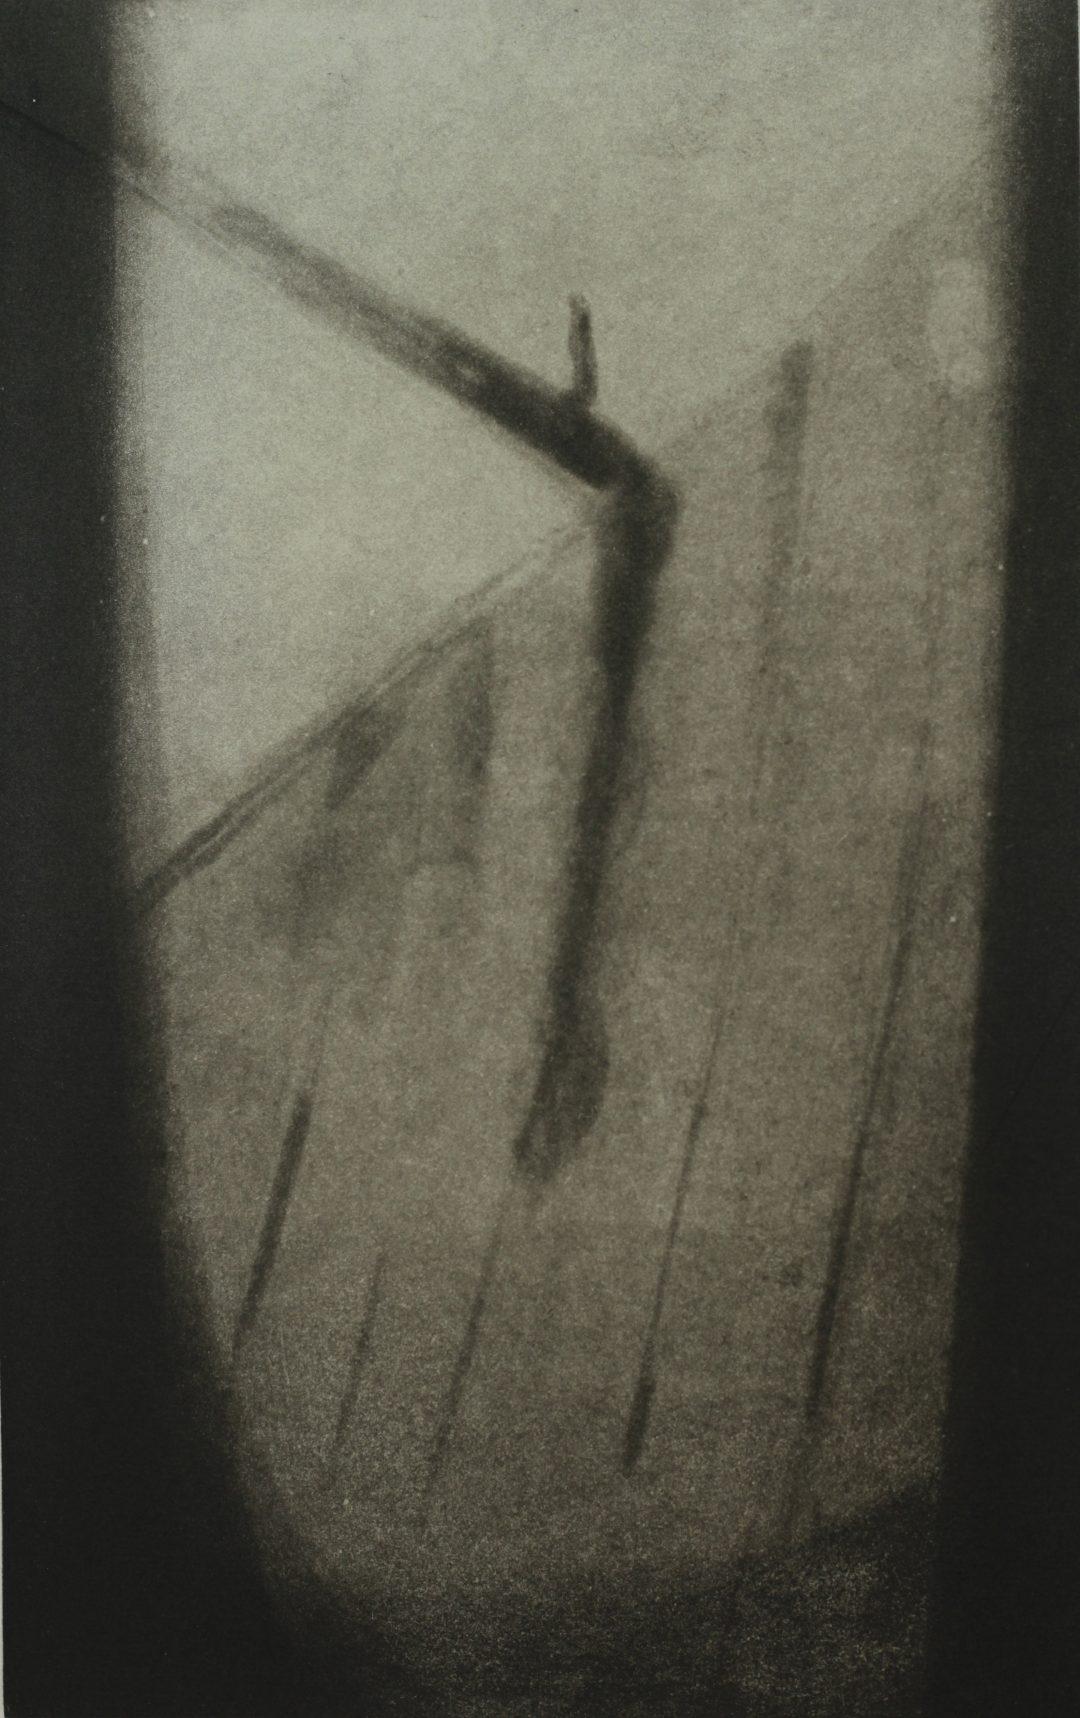 Gloaming Nick Richards Etching, 18.5 x 29cm, 2016